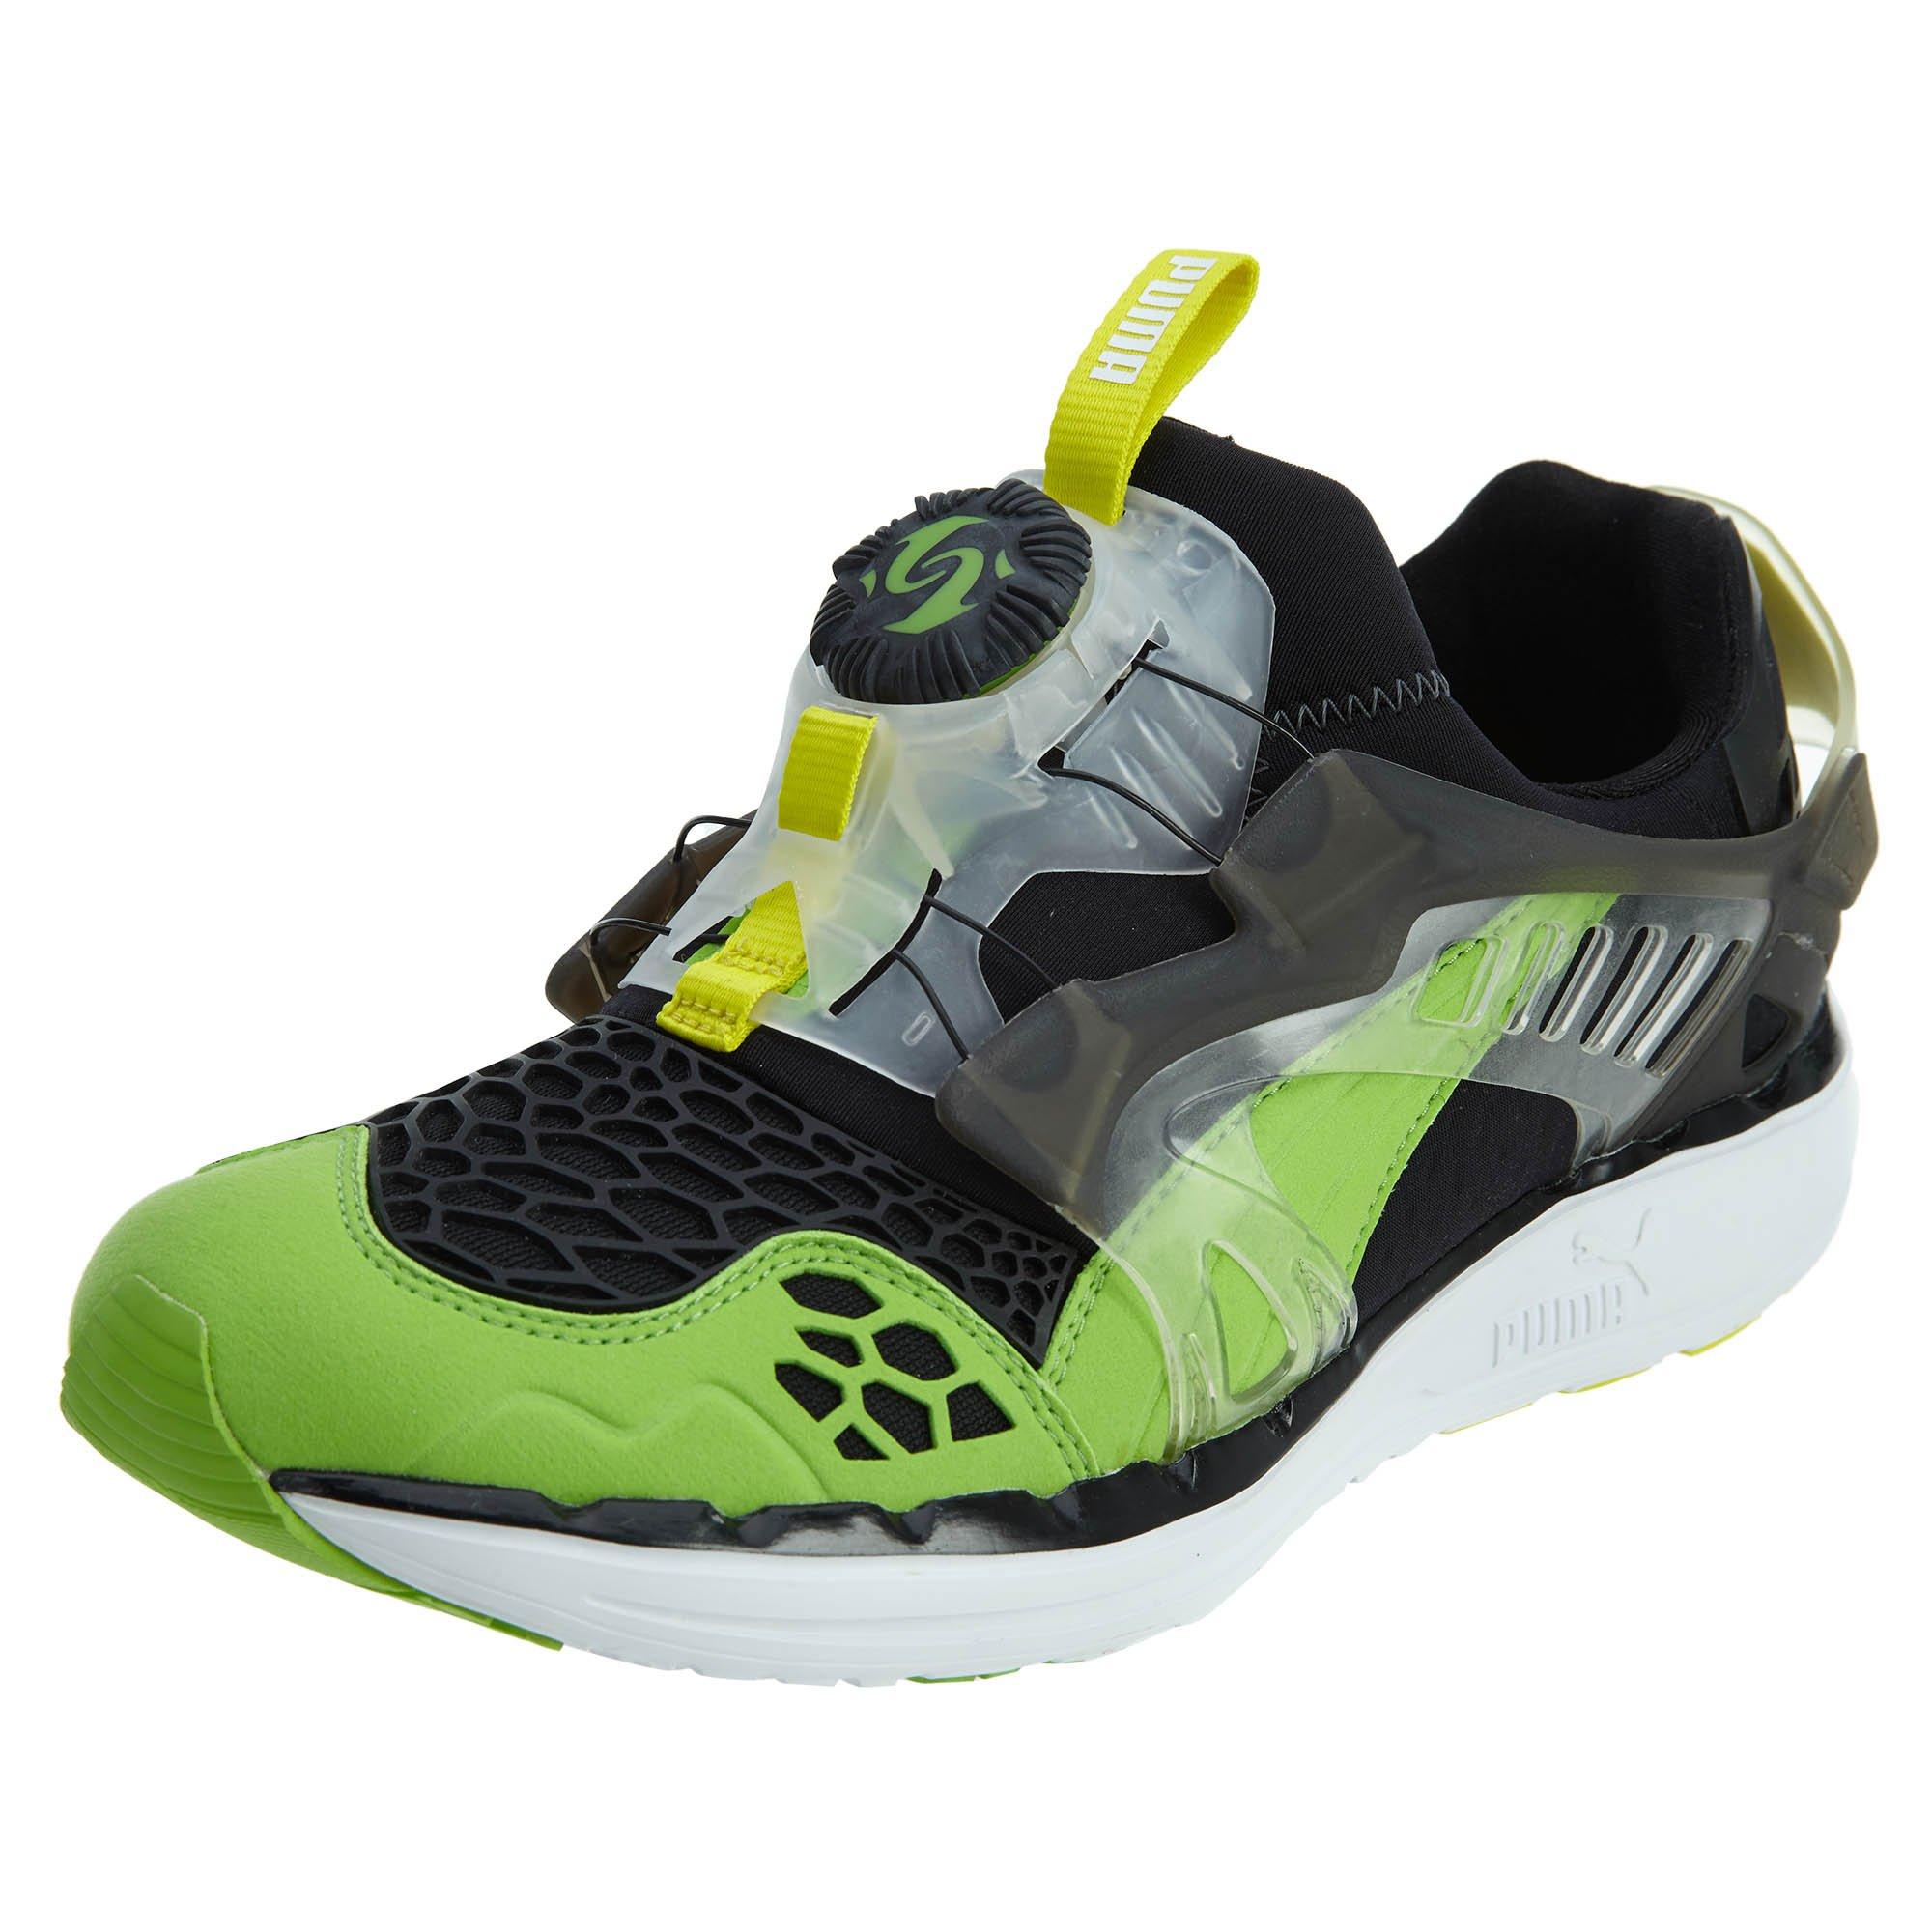 PUMA Future Disc Blaze Lite Web Fashion Sneaker,Black/Jasmine Green/Fluorescent Yellow,12 D US